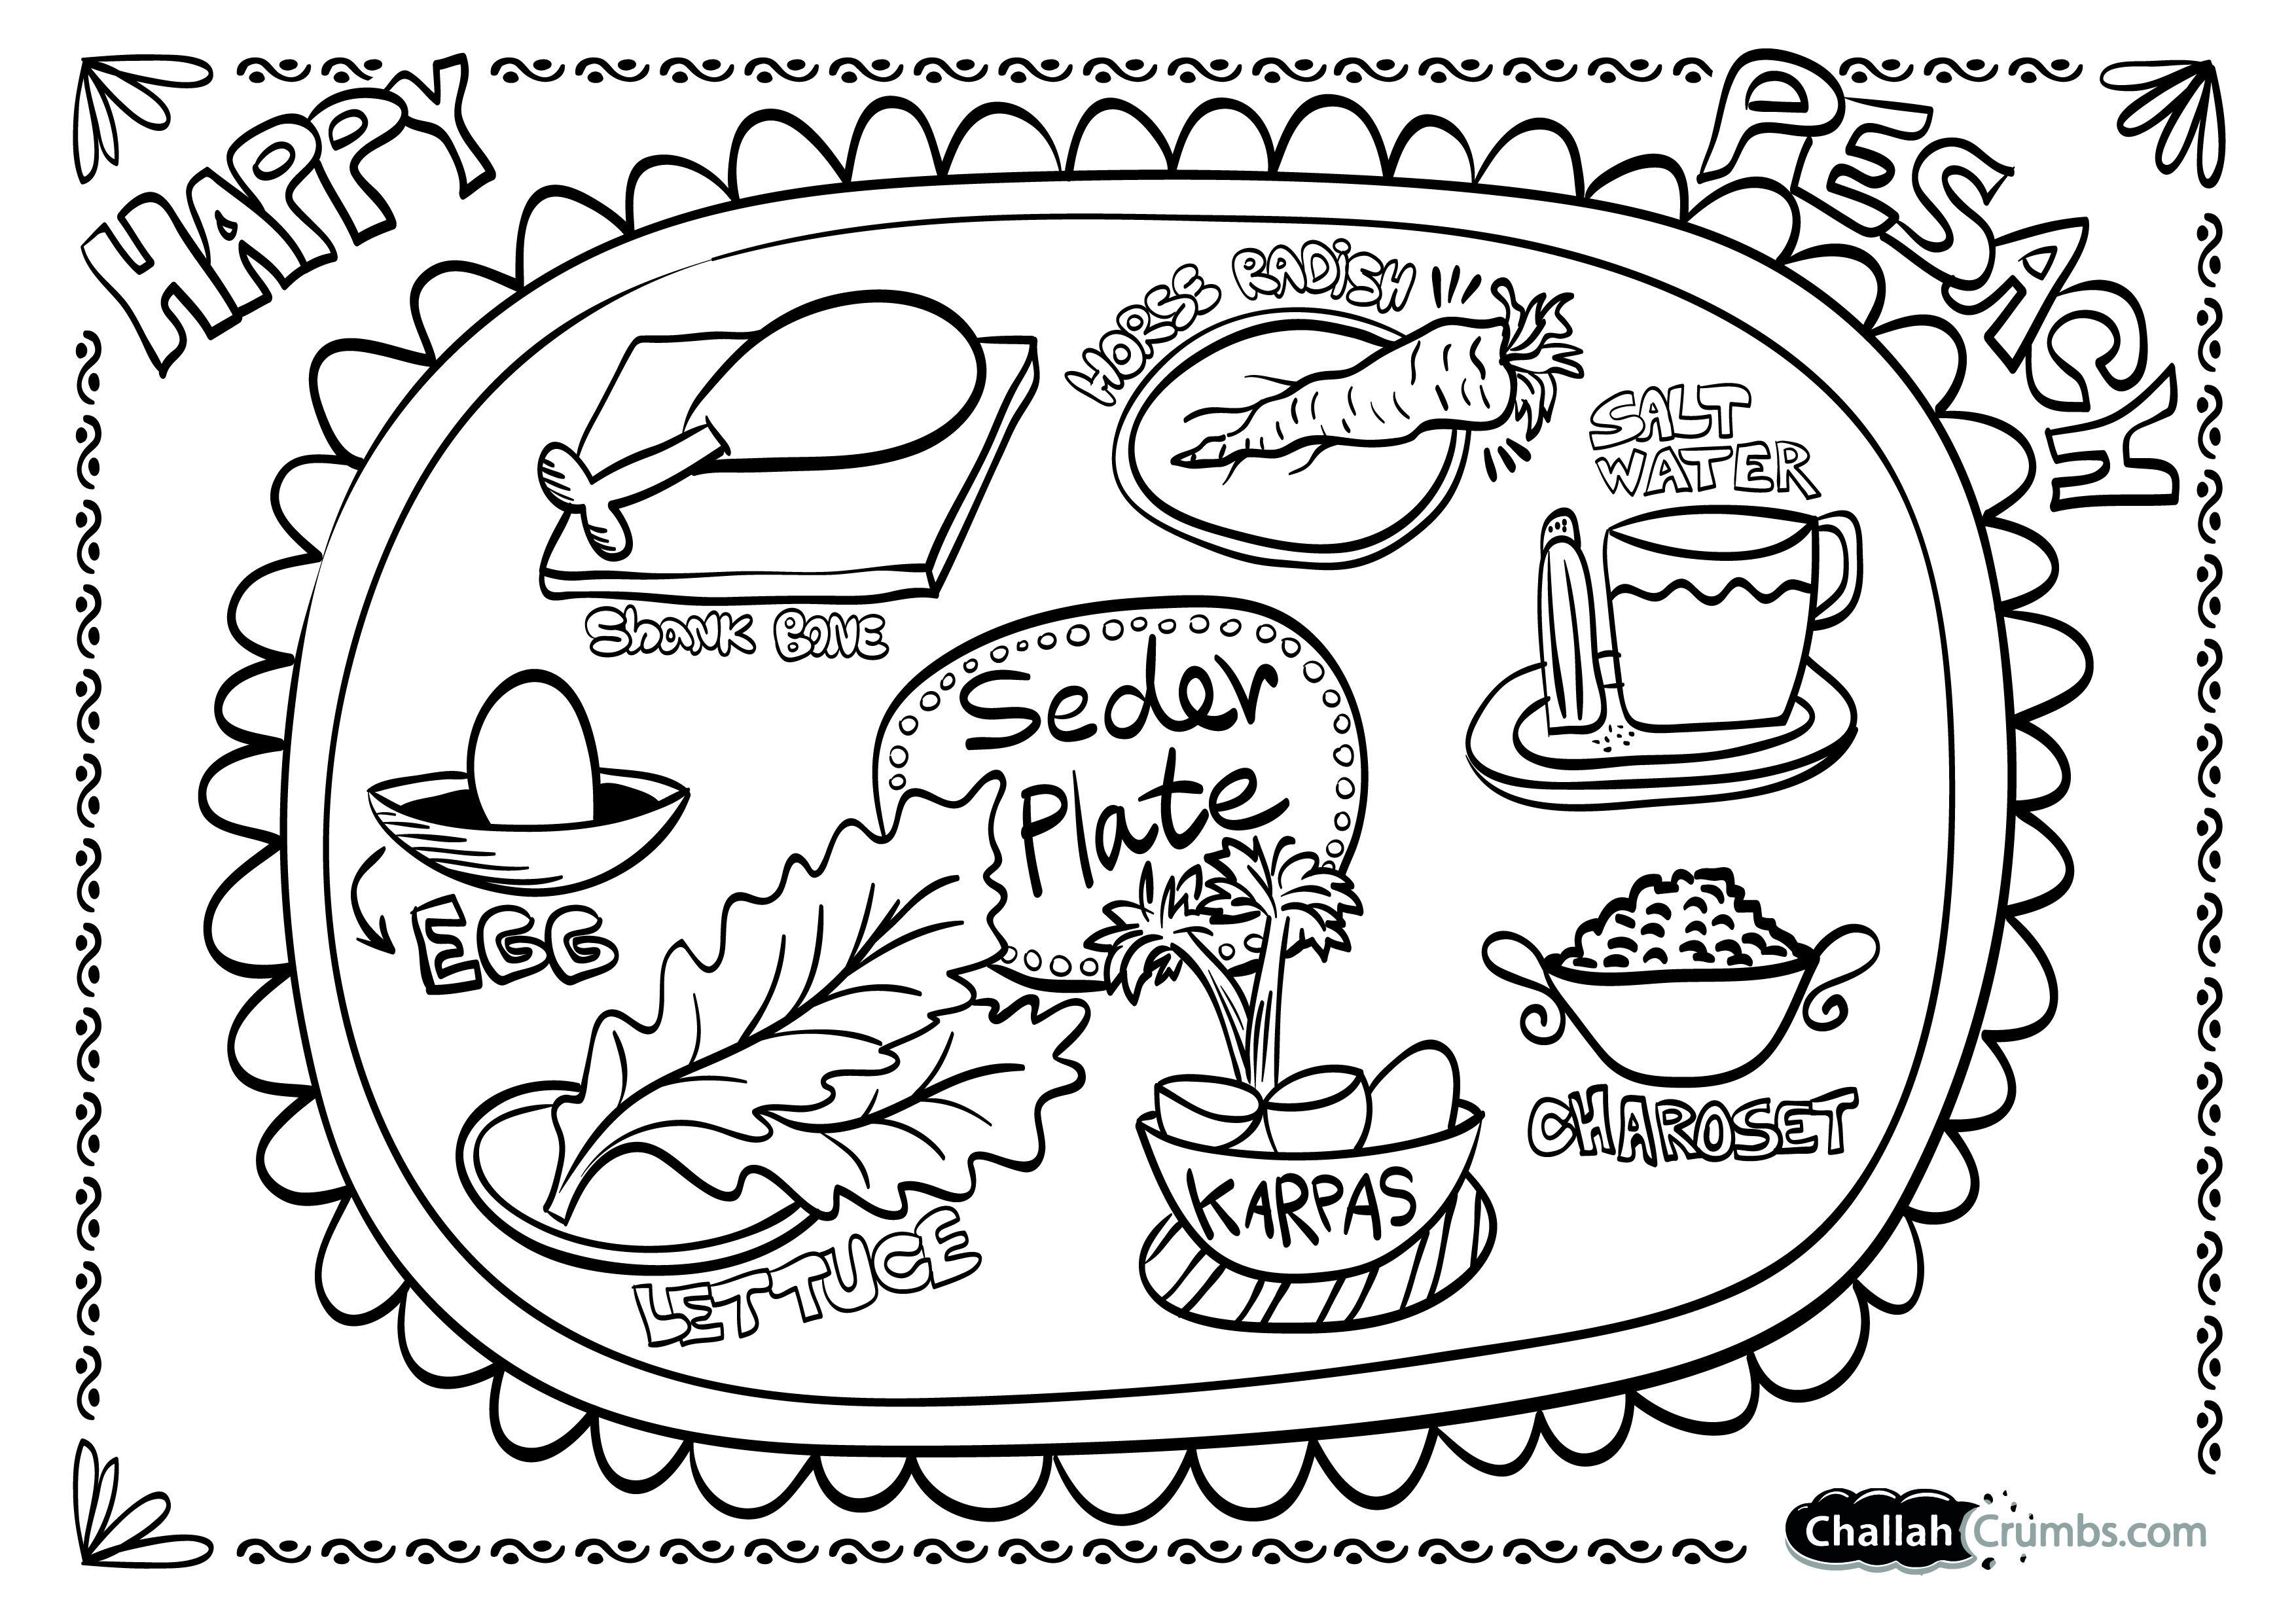 Coloring Page Seder Plate Challah Crumbs Seder Plate